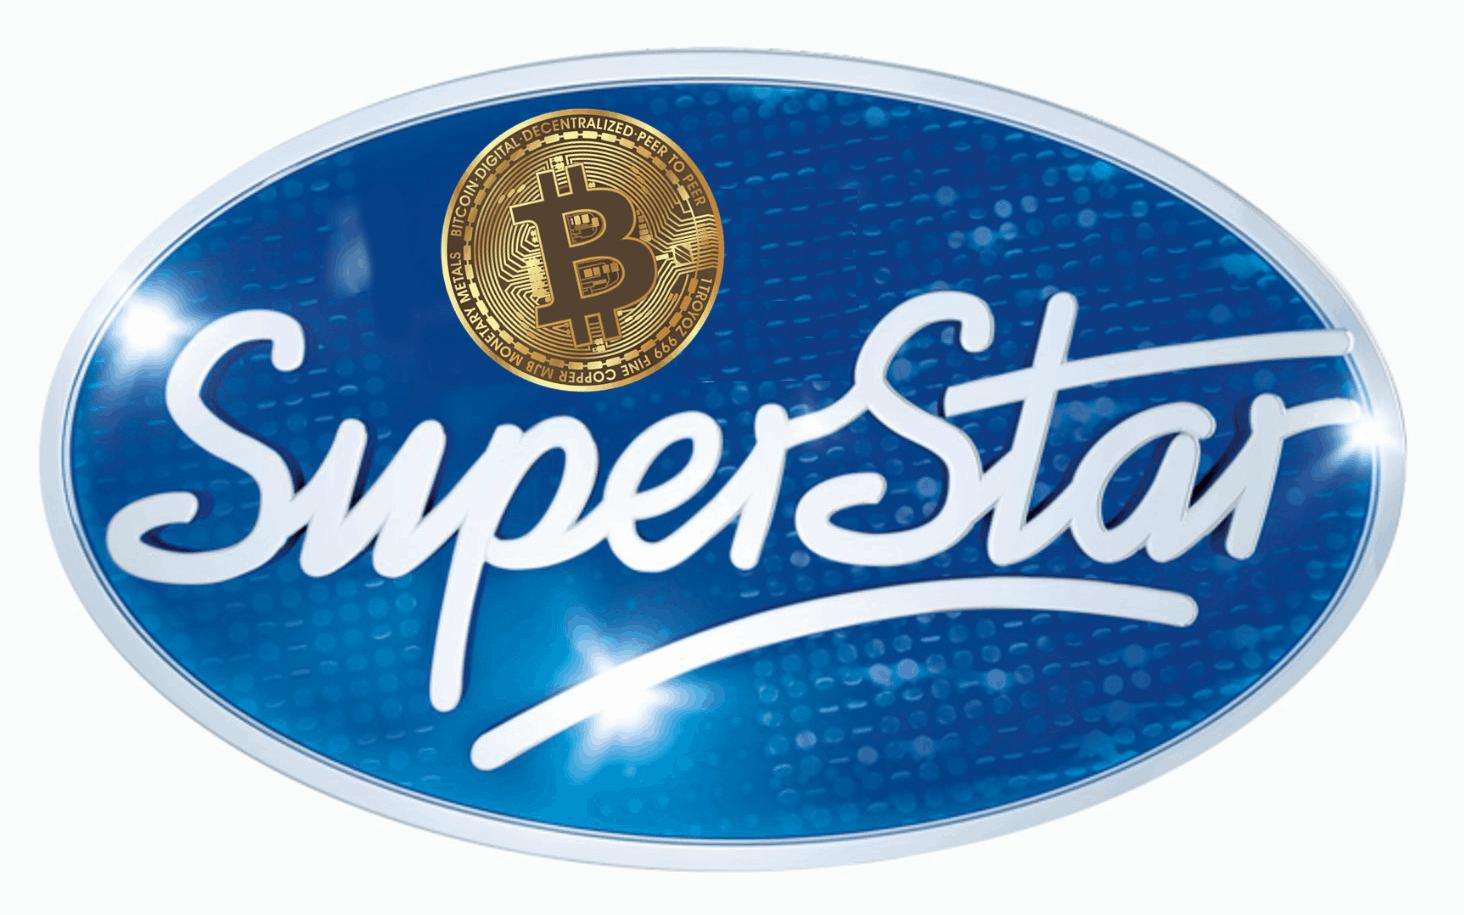 Bitcoin SuperStar logo kleur 1 BTC Crypto